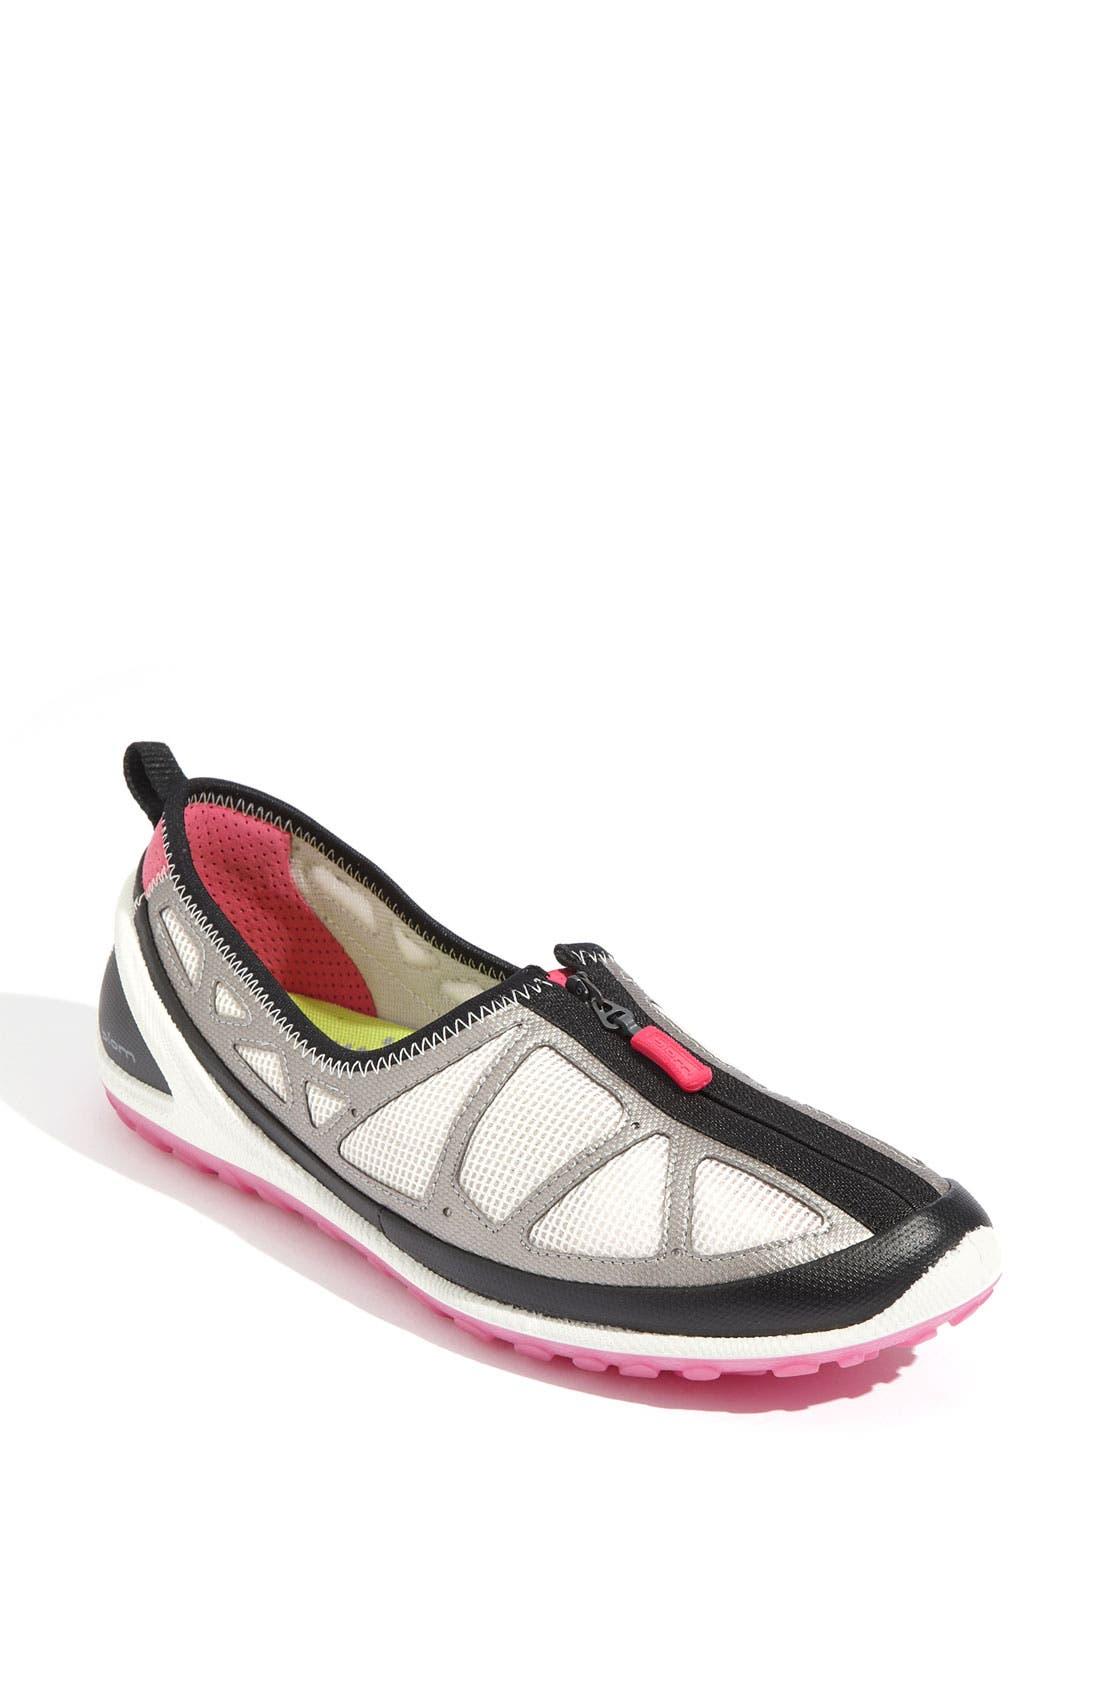 Alternate Image 1 Selected - ECCO 'Biom Lite Zip' Sneaker (Women)